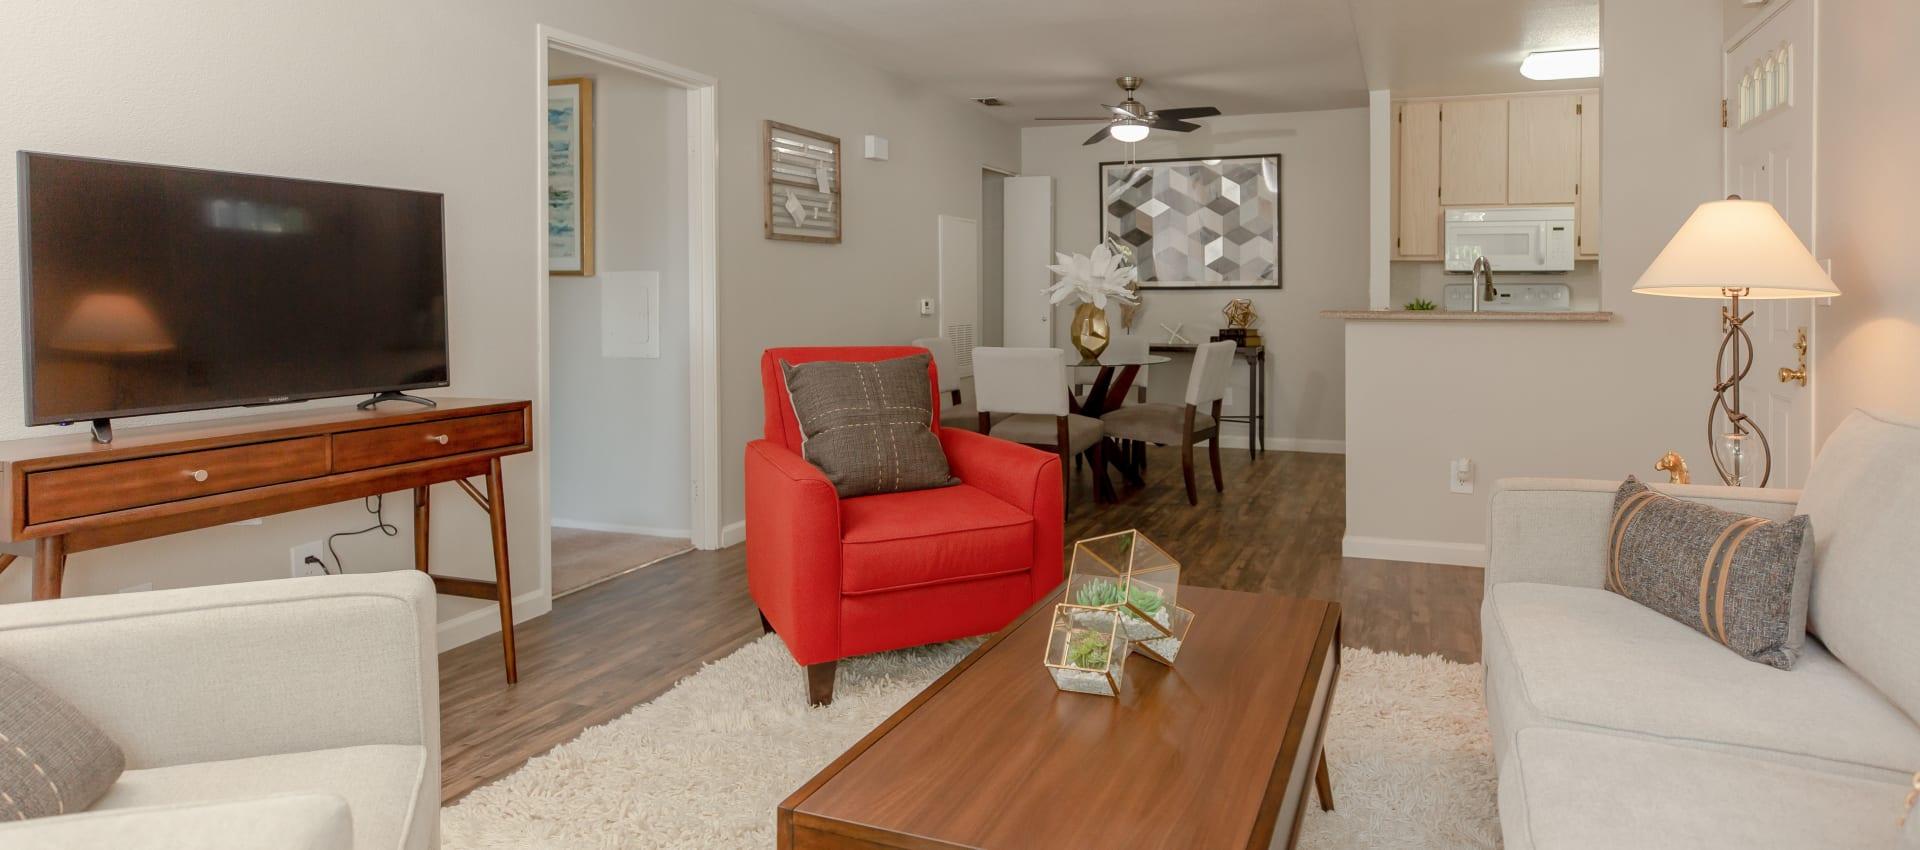 Living room and kitchen at Shaliko in Rocklin, California.